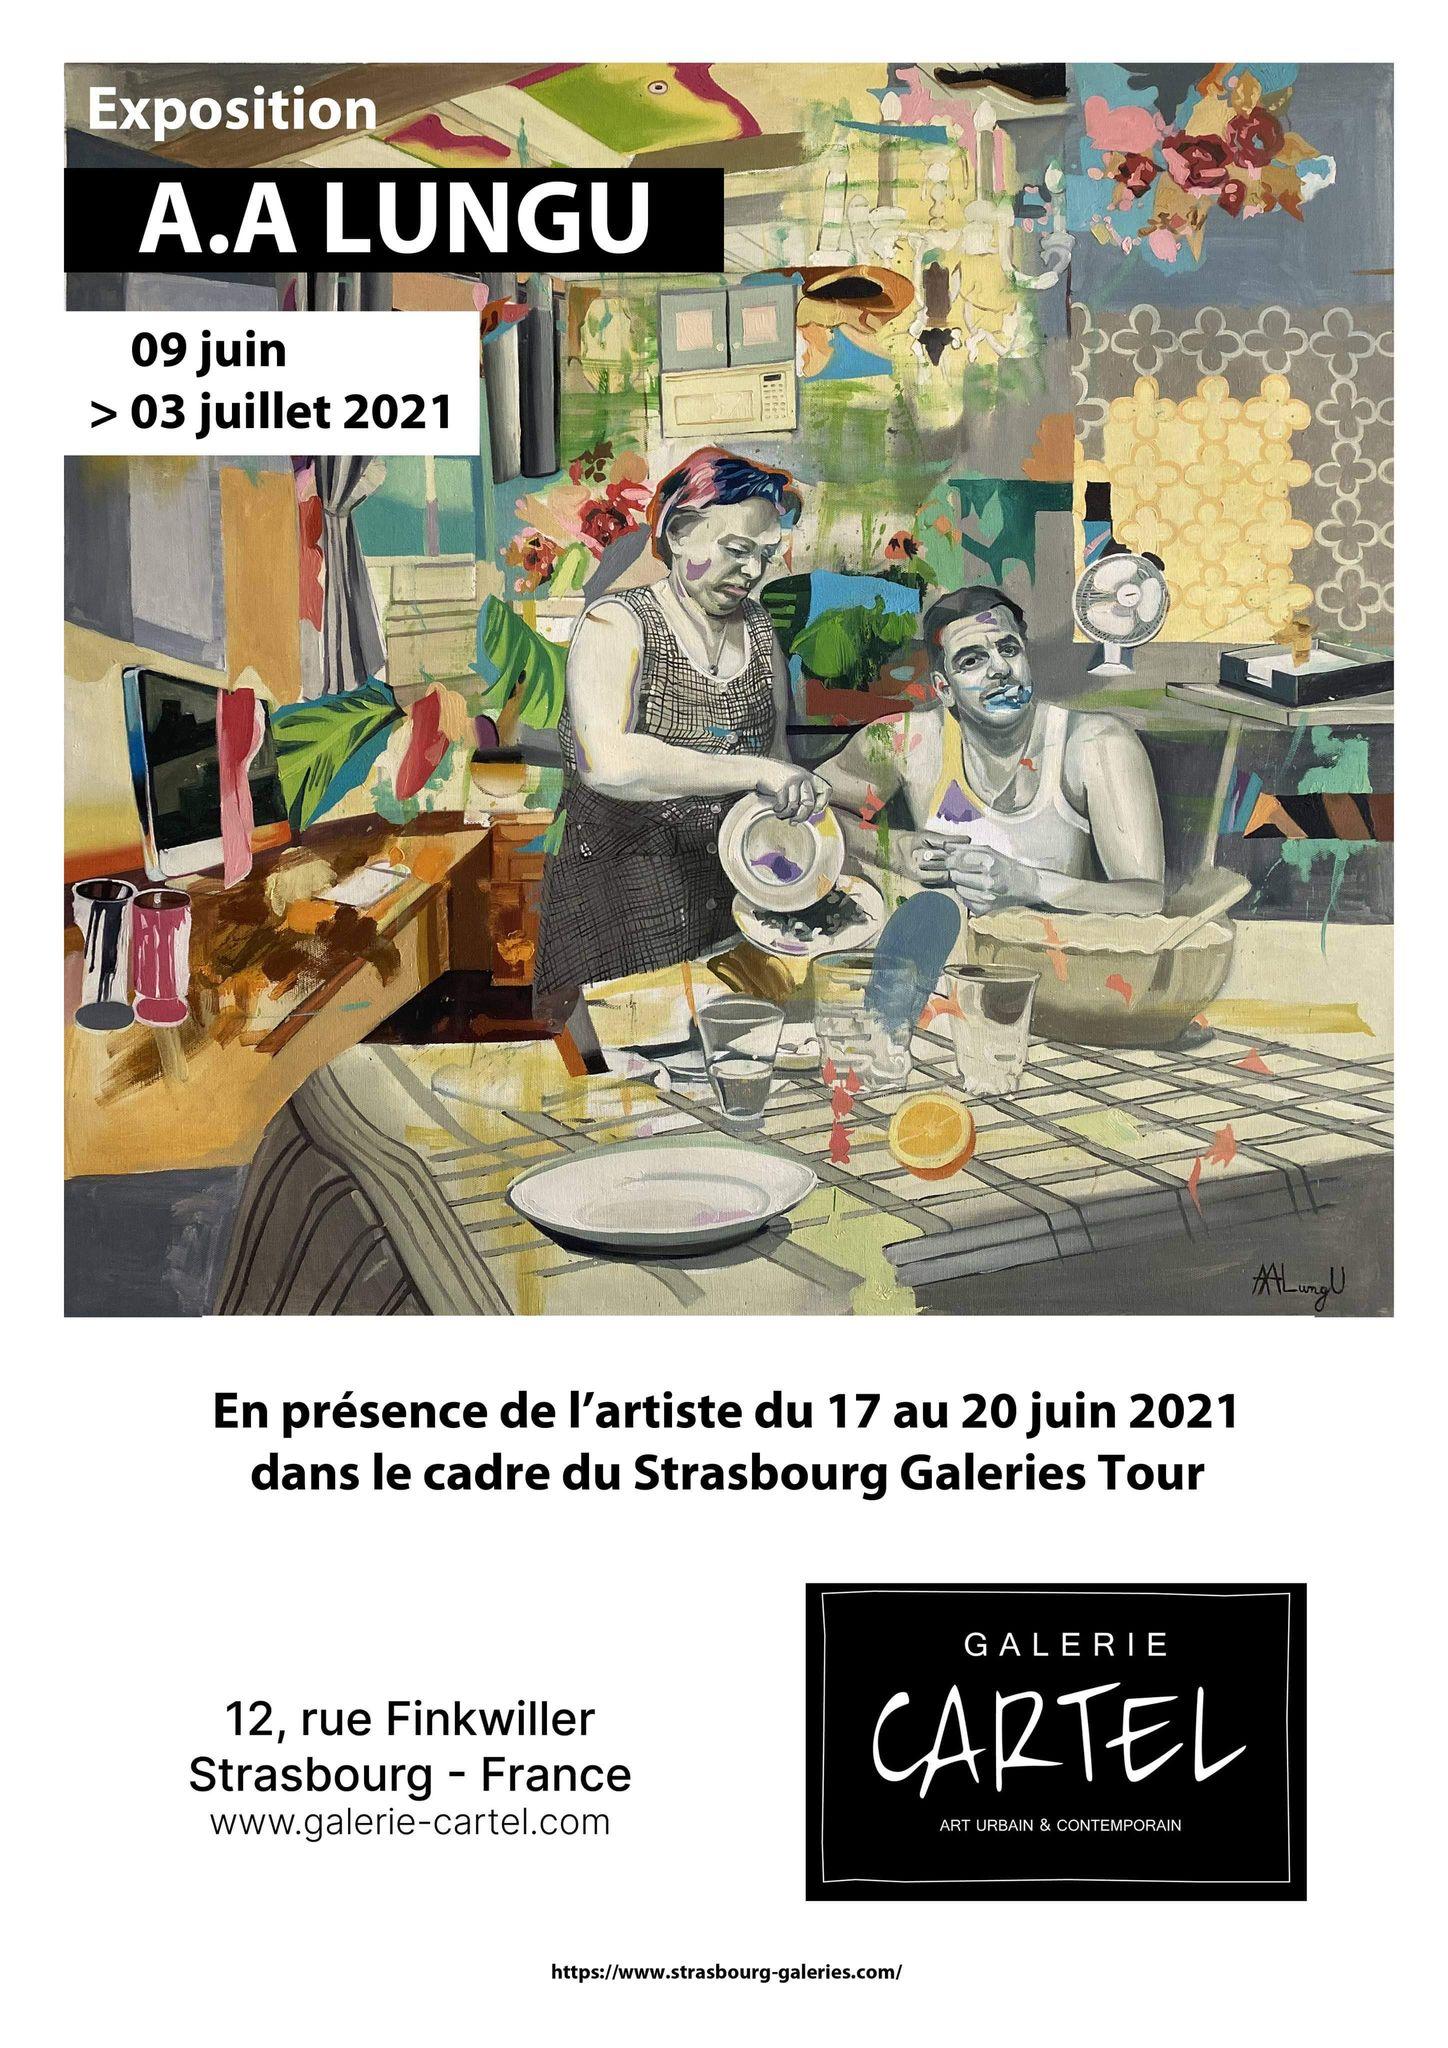 Exibition at Cartel Gallery Strasbourg